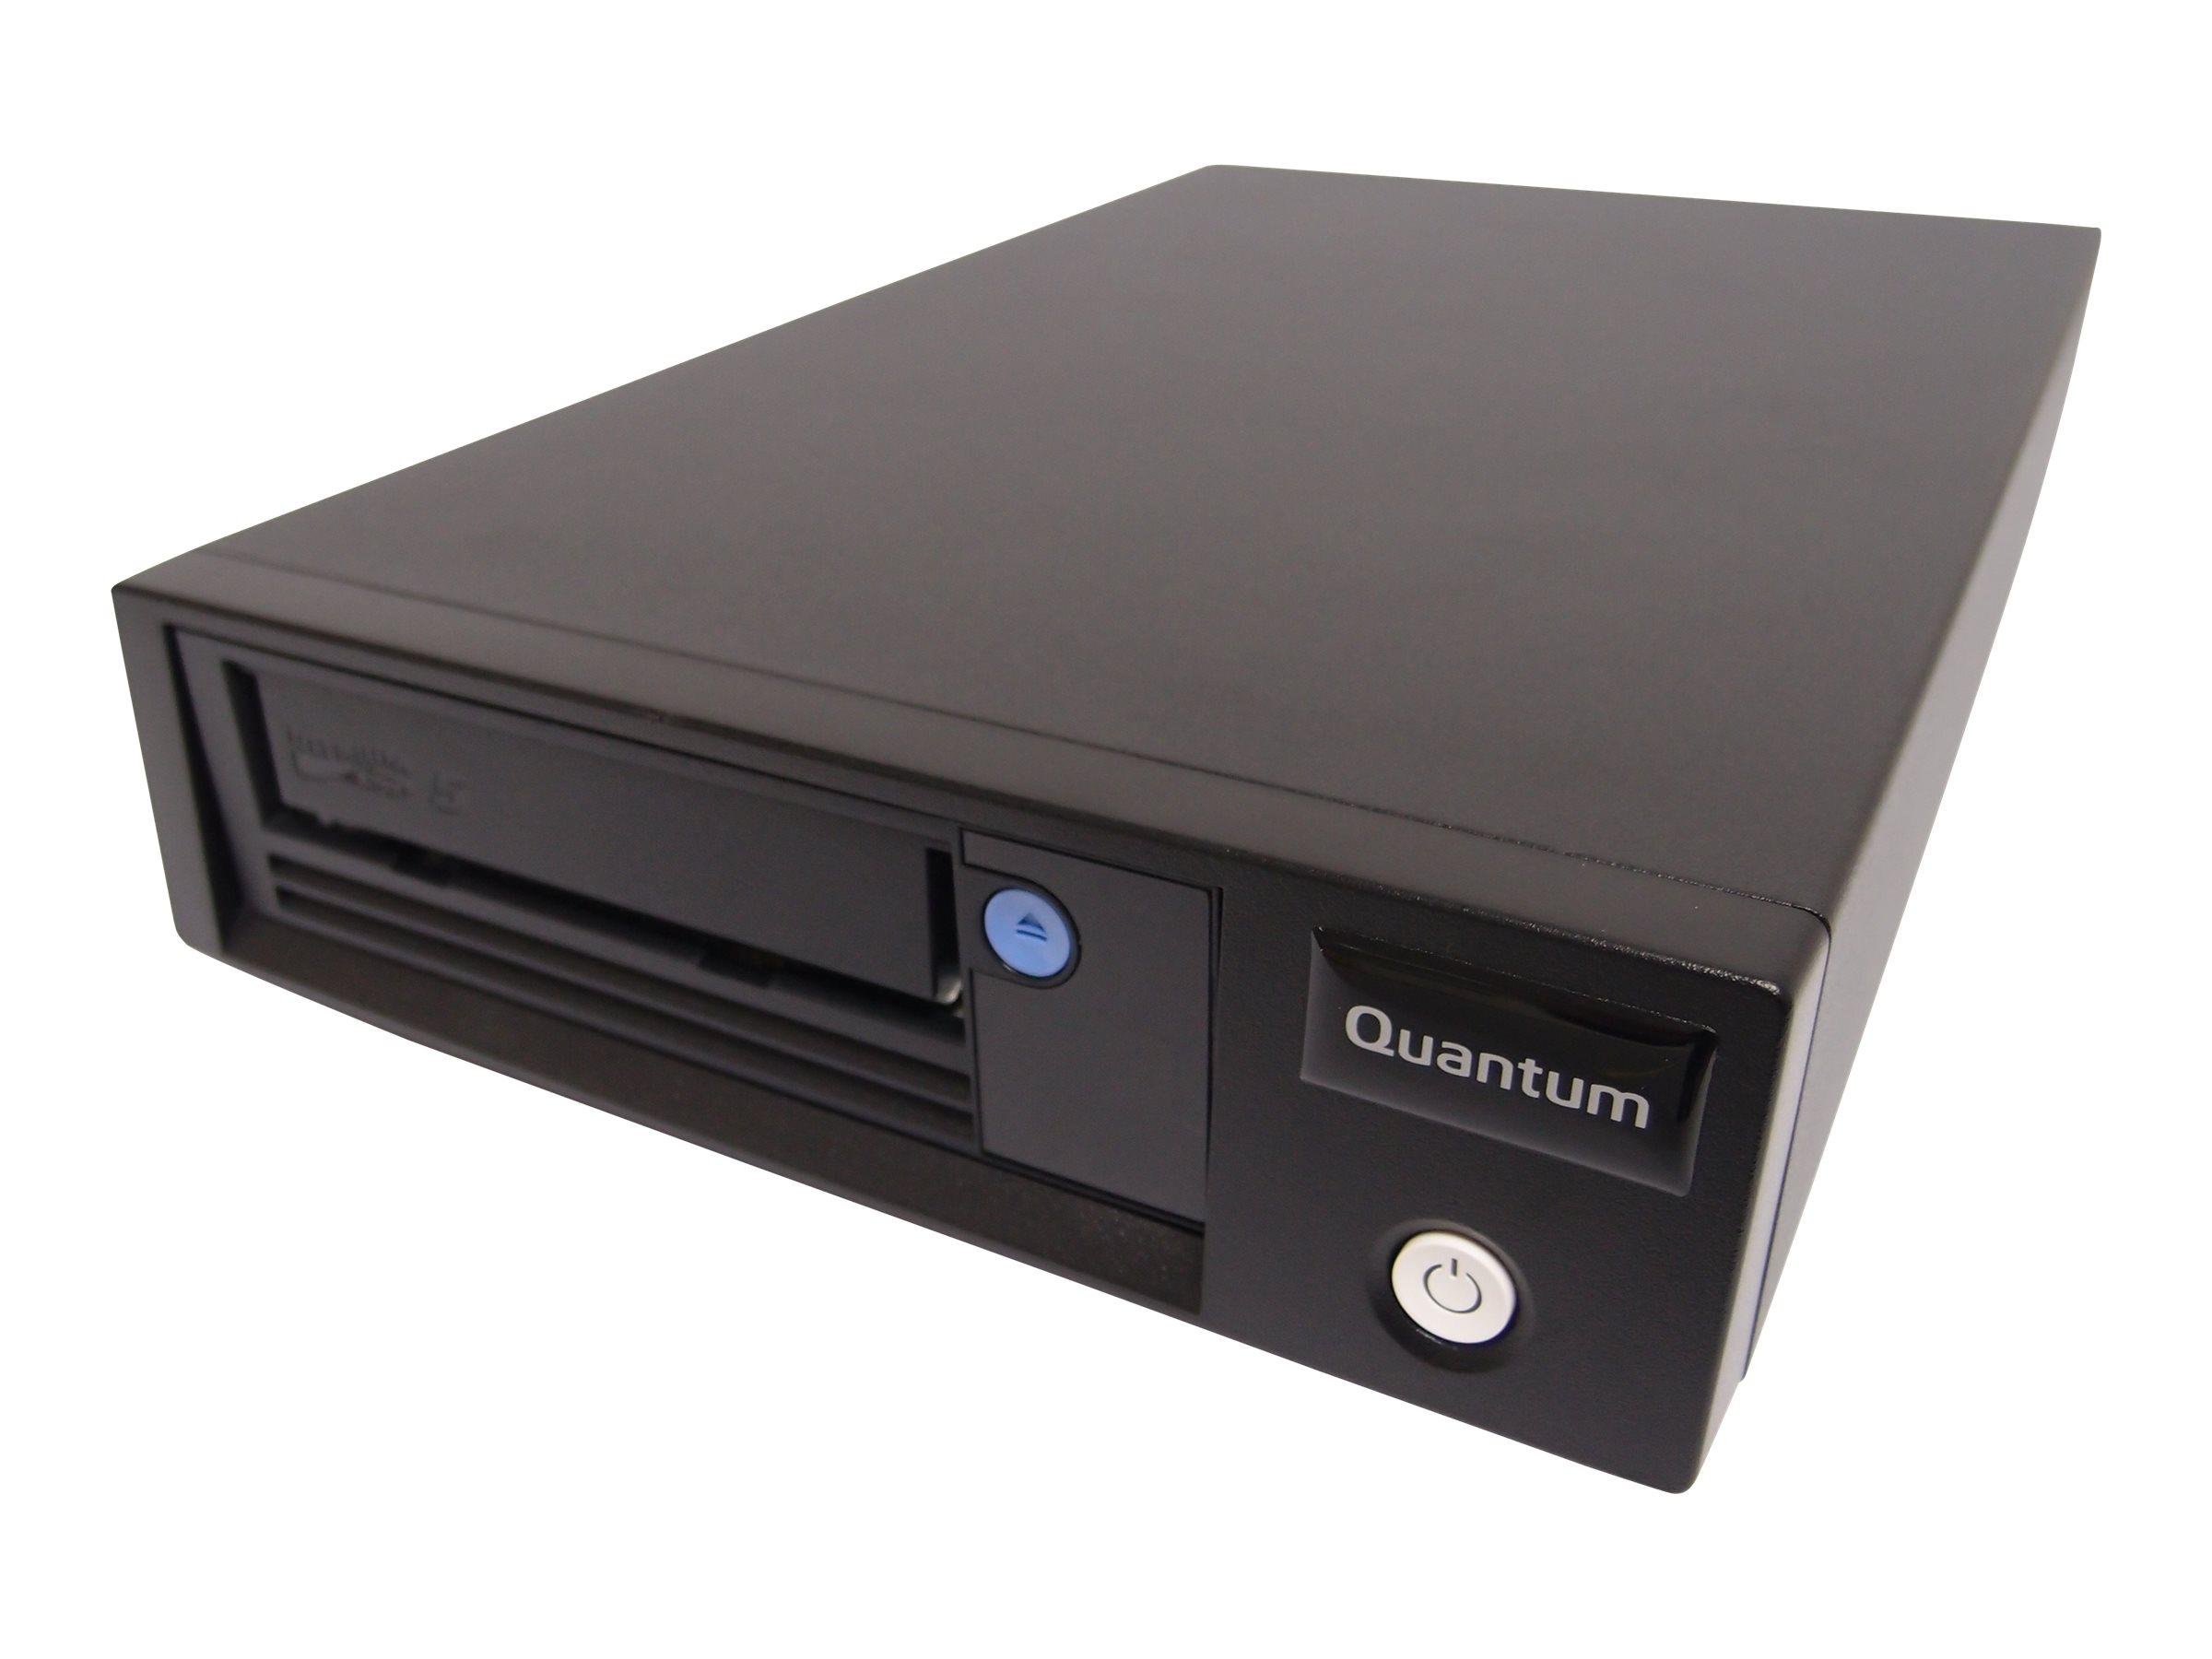 Quantum LTO-5 HH - Bandlaufwerk - LTO Ultrium (1.5 TB / 3 TB) - Ultrium 5 - SAS-2 - extern